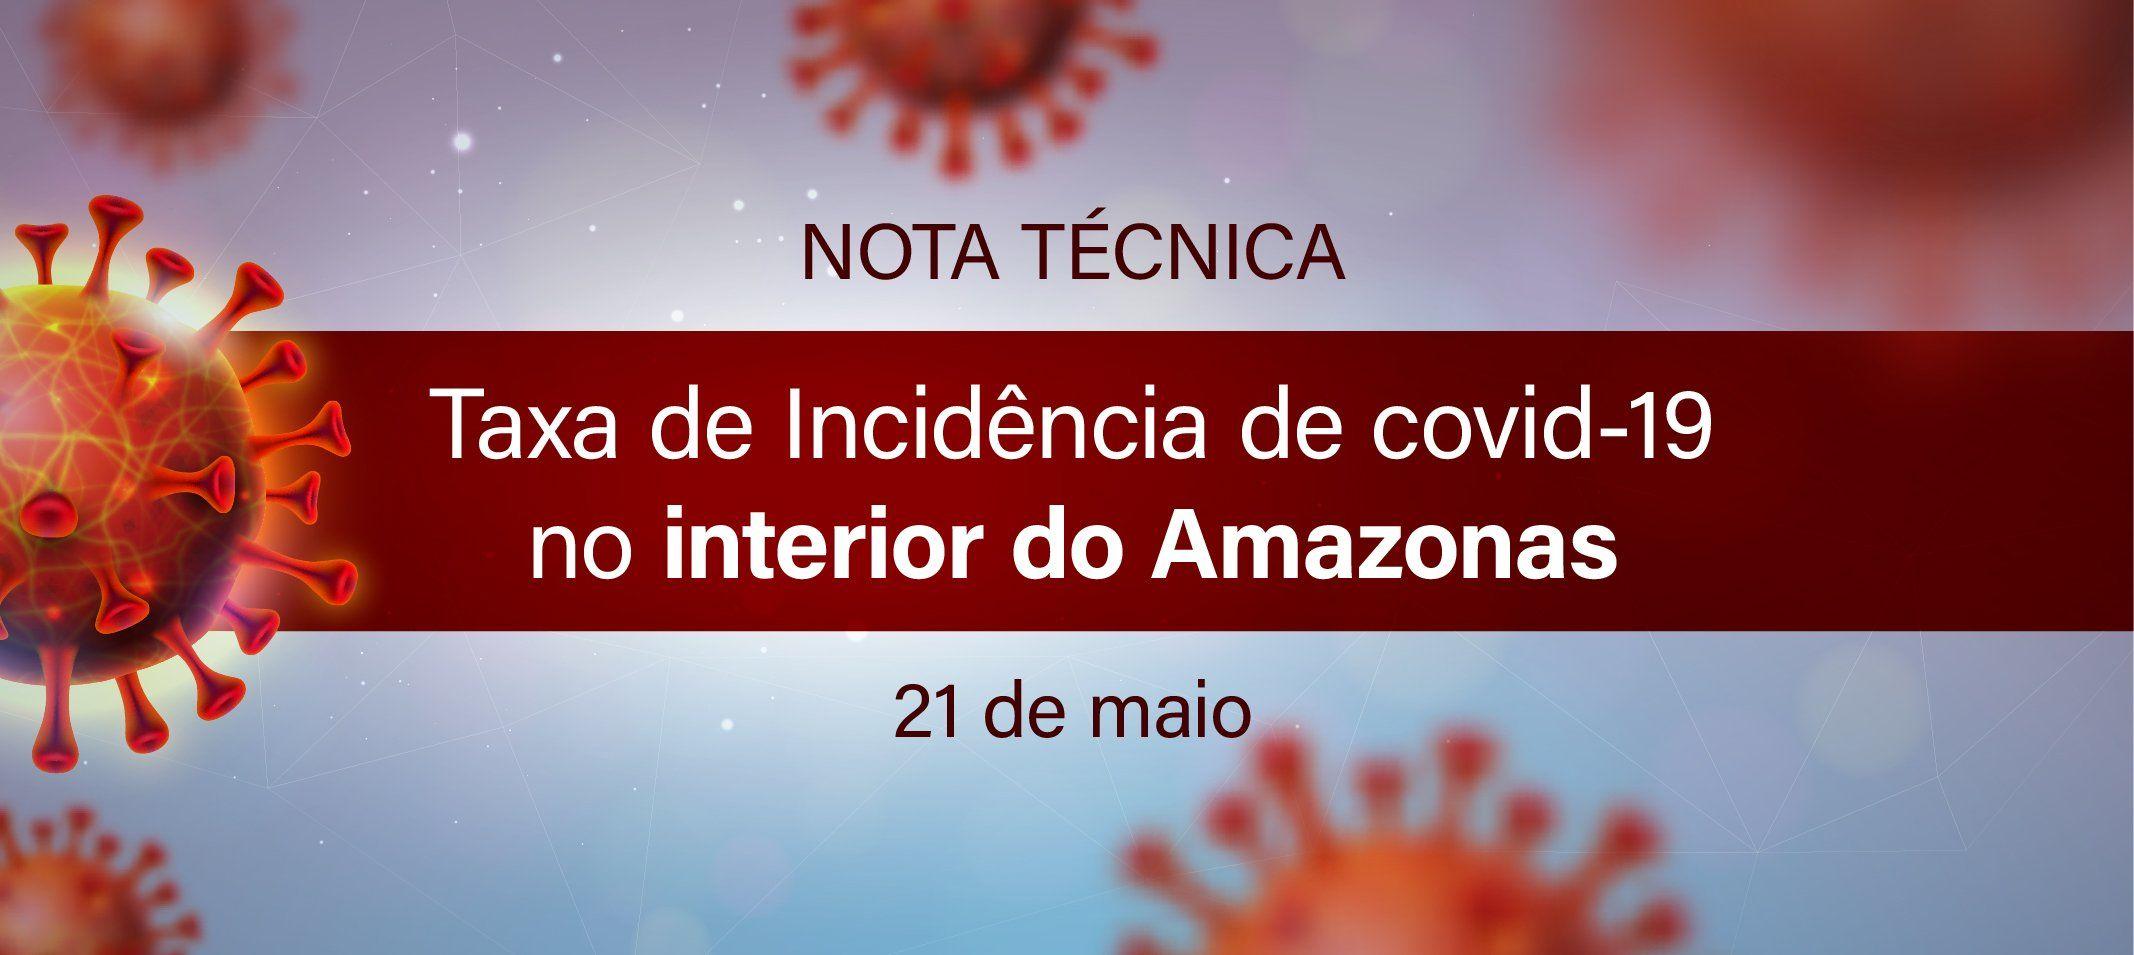 Departamento de Economia divulga Nota Técnica sobre impacto do coronavírus no Amazonas